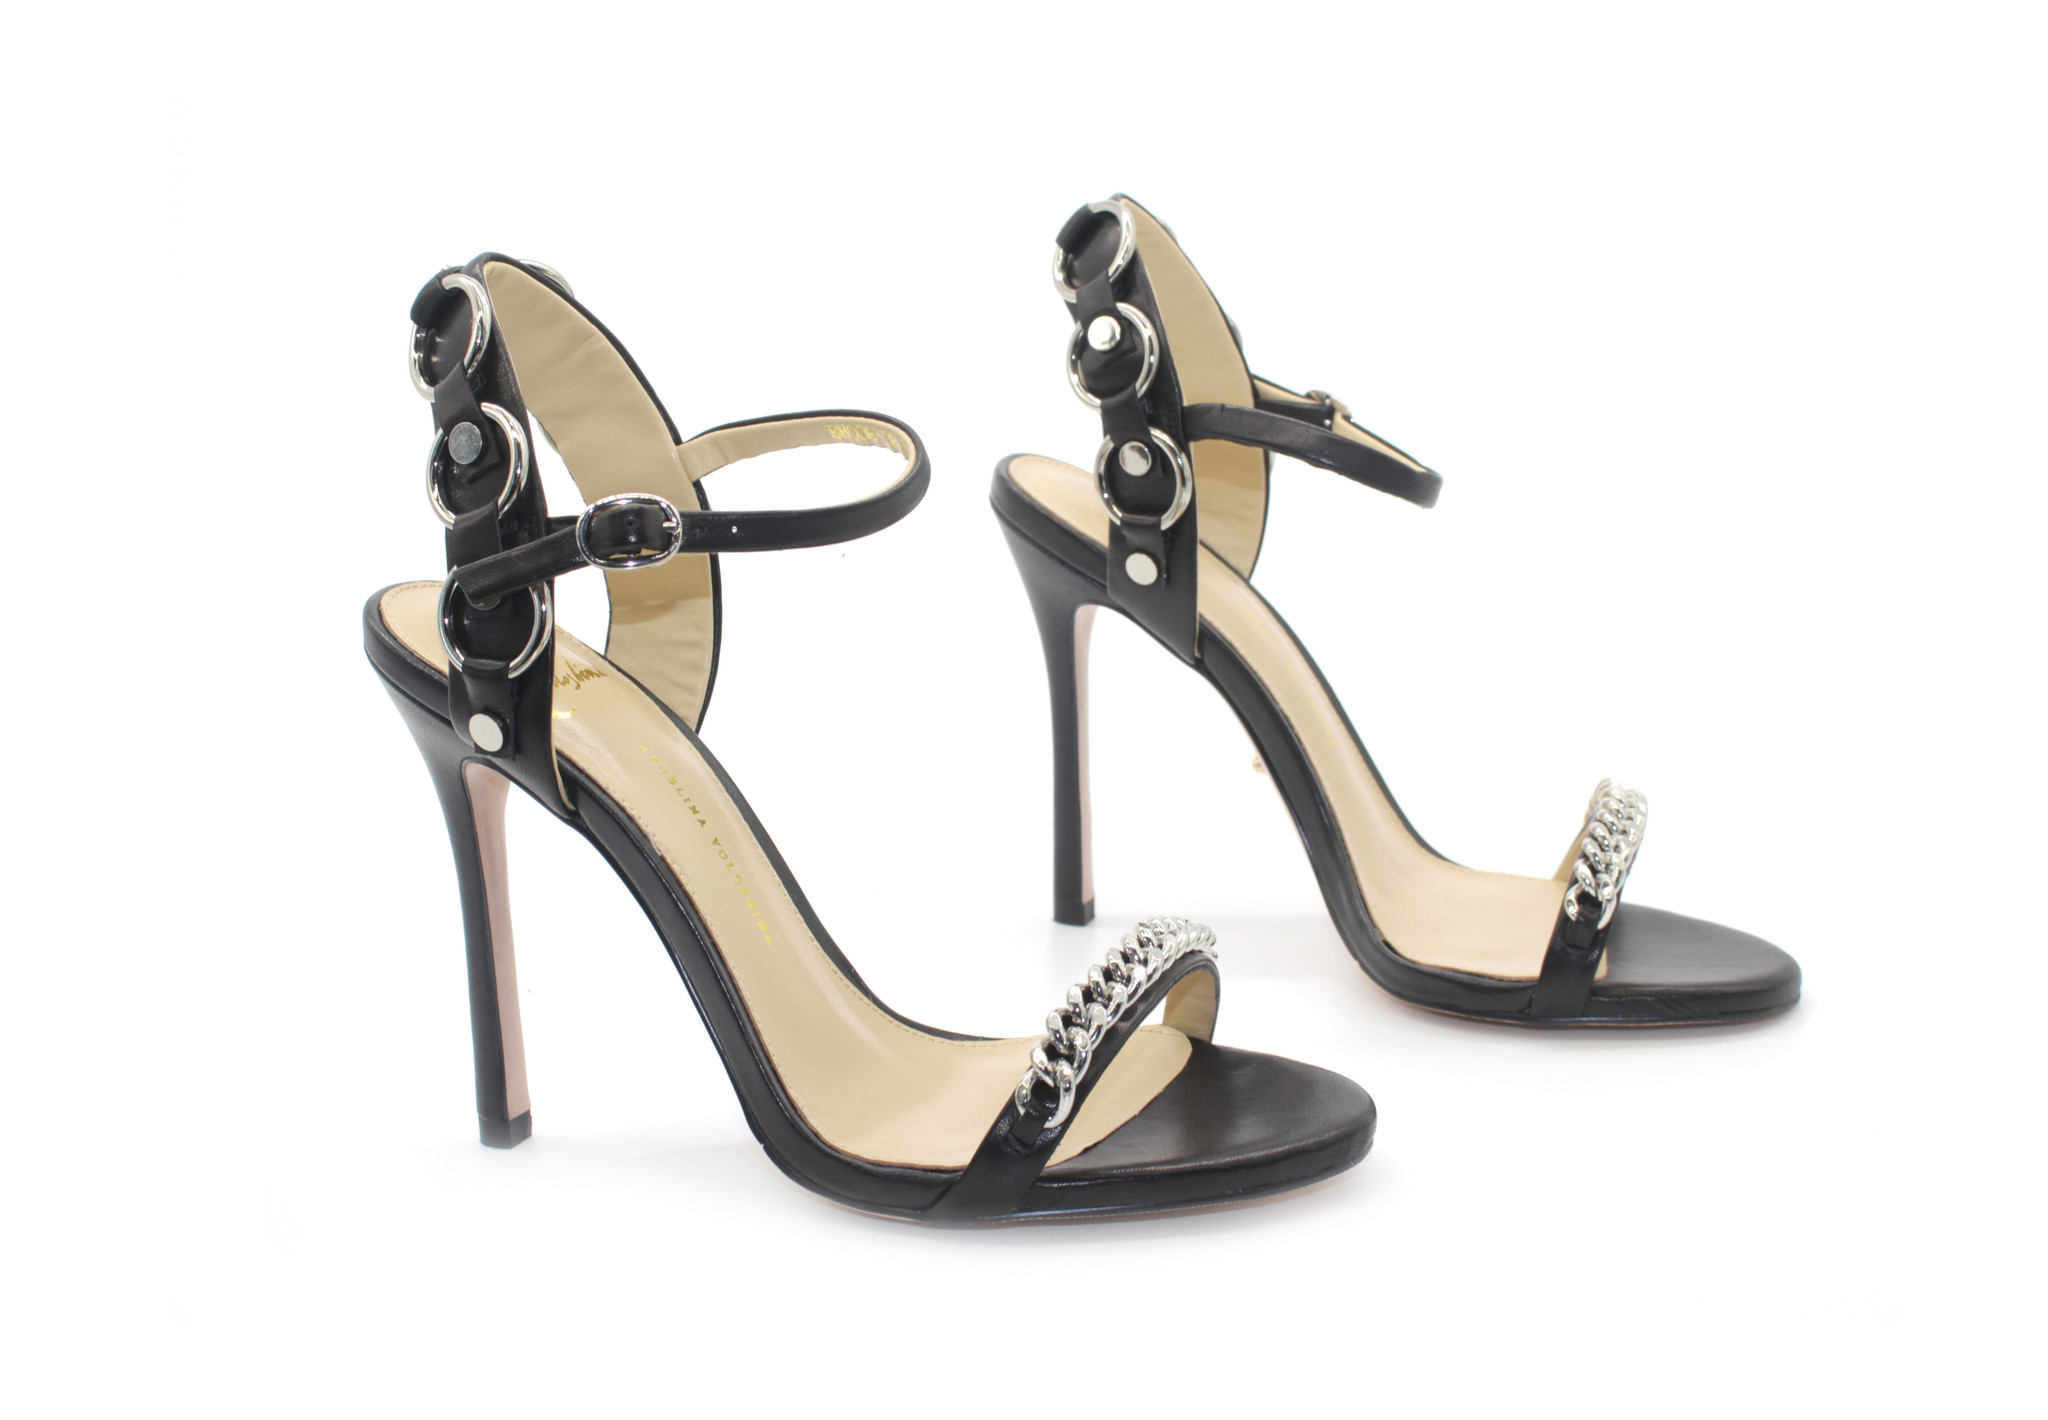 Beautiful Sandals - Black Medium Heel Slingback Sandals